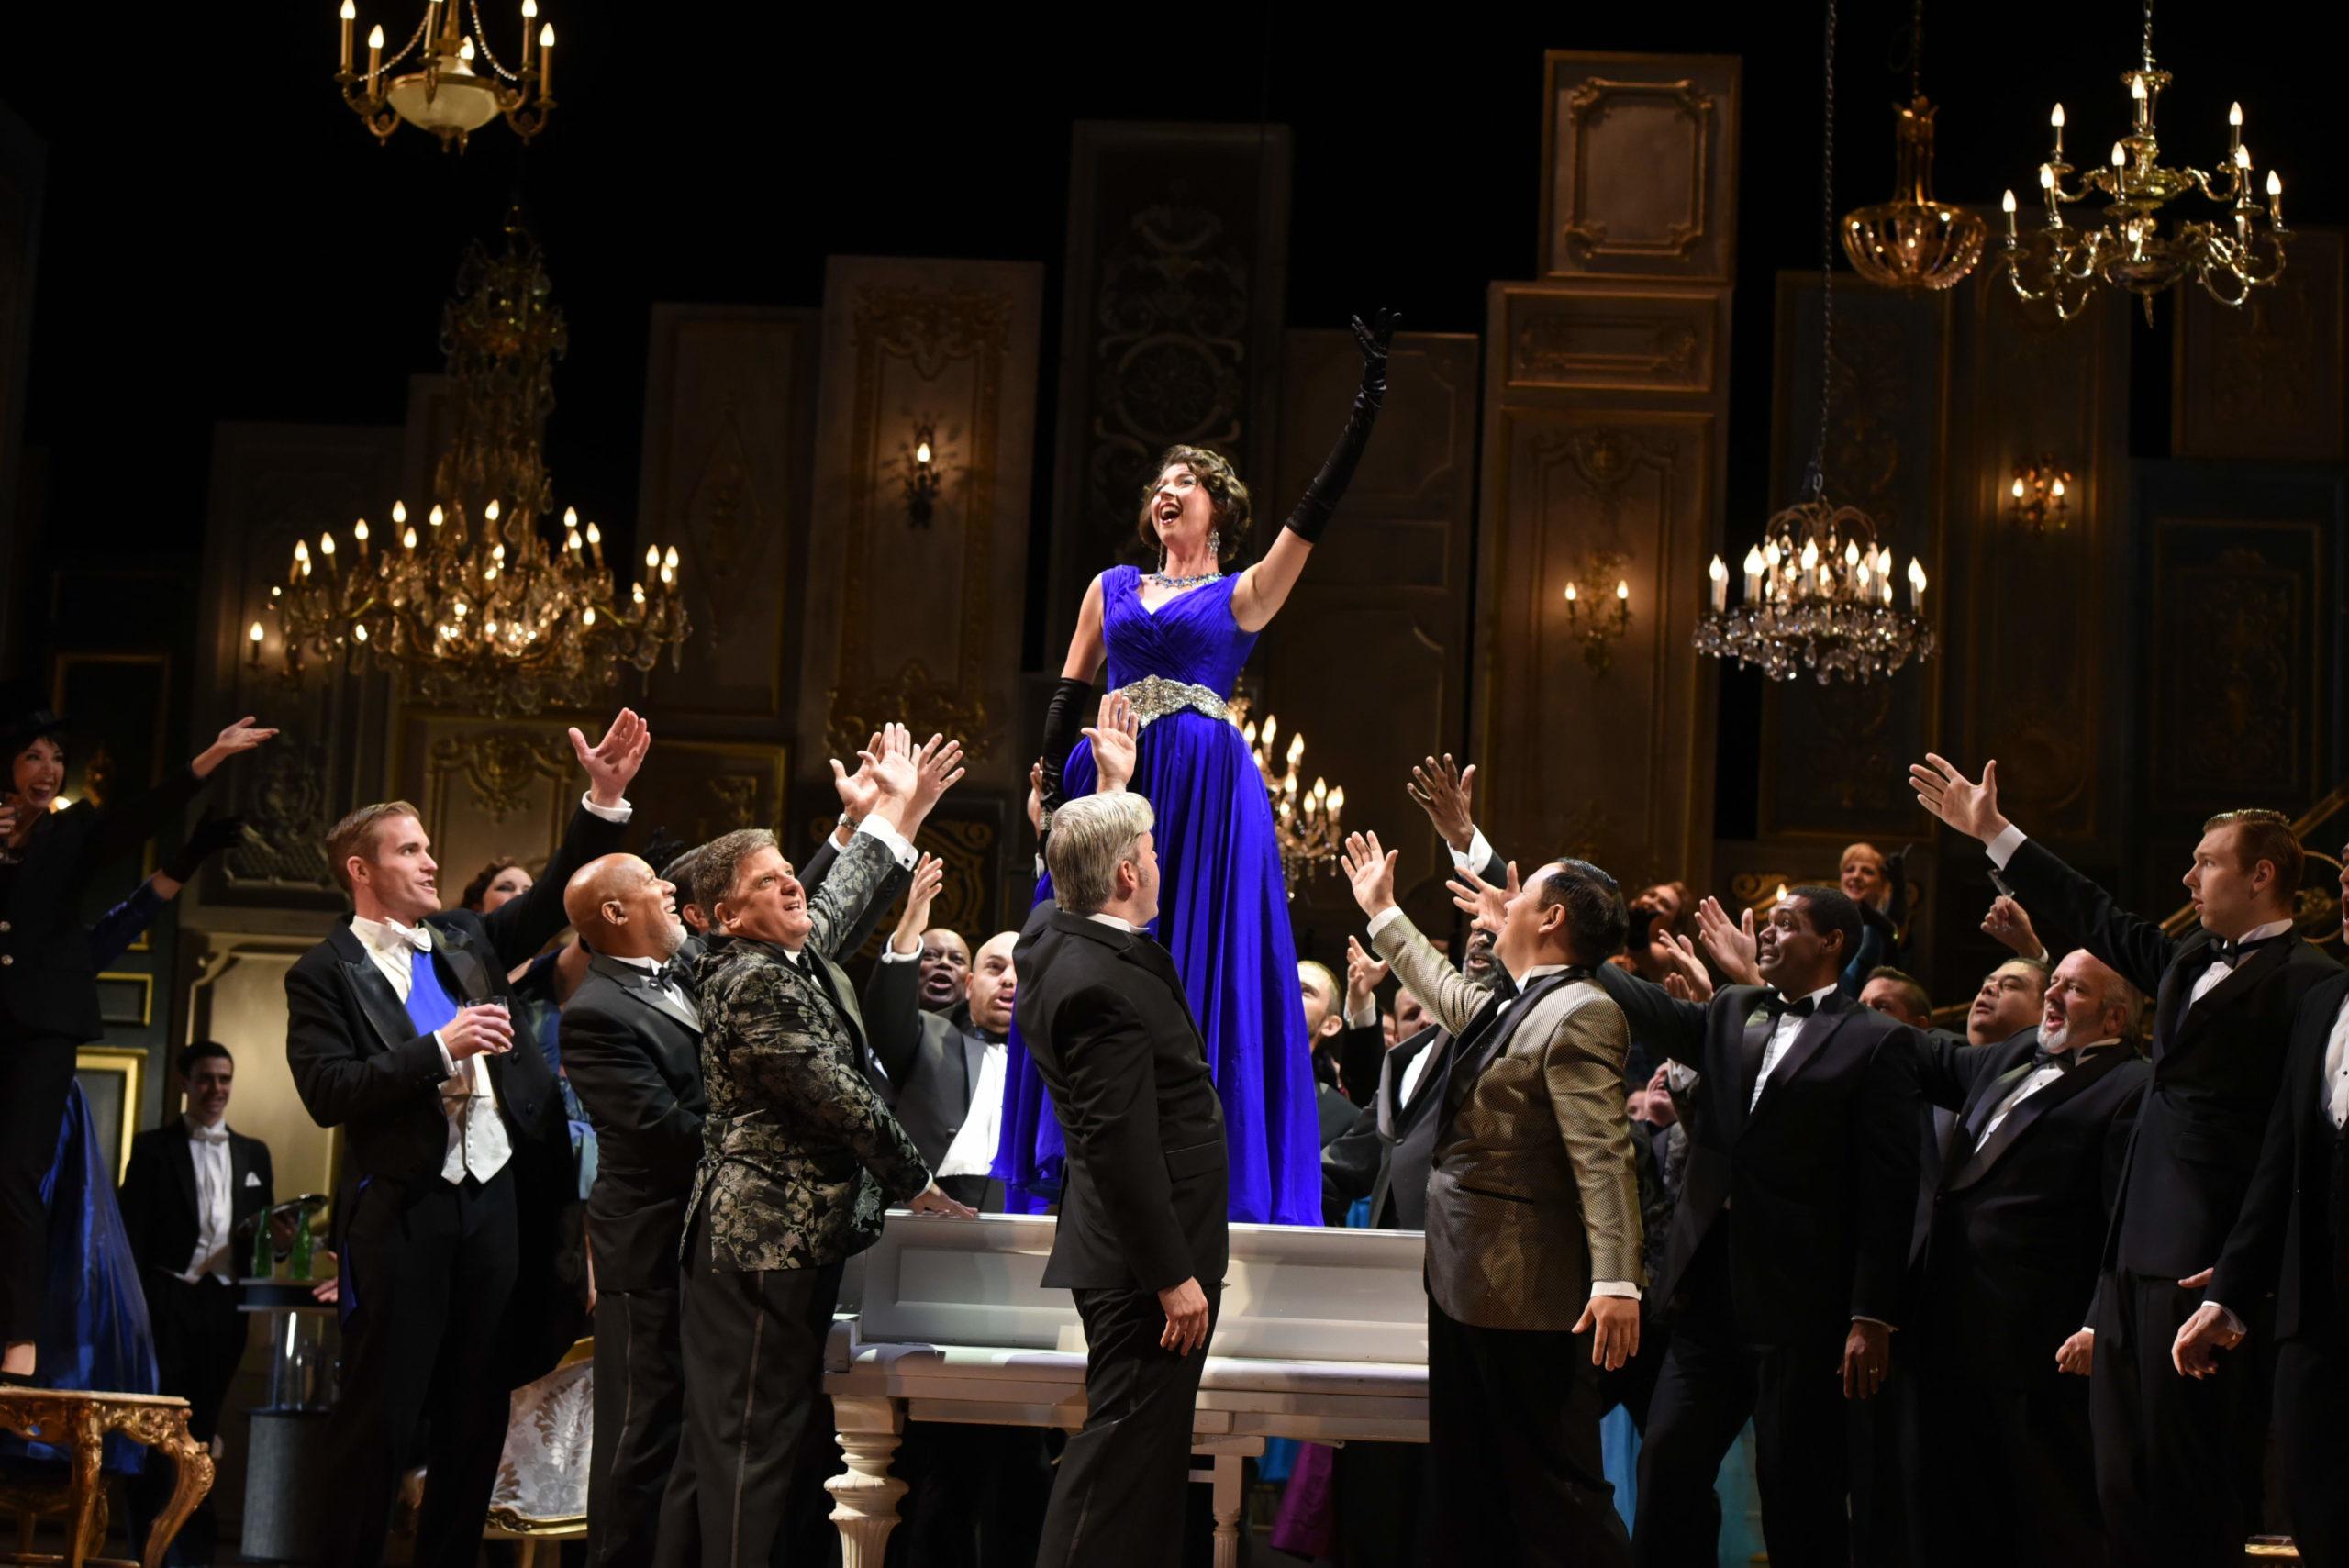 lisette-oropesa-traviata-philadelphia